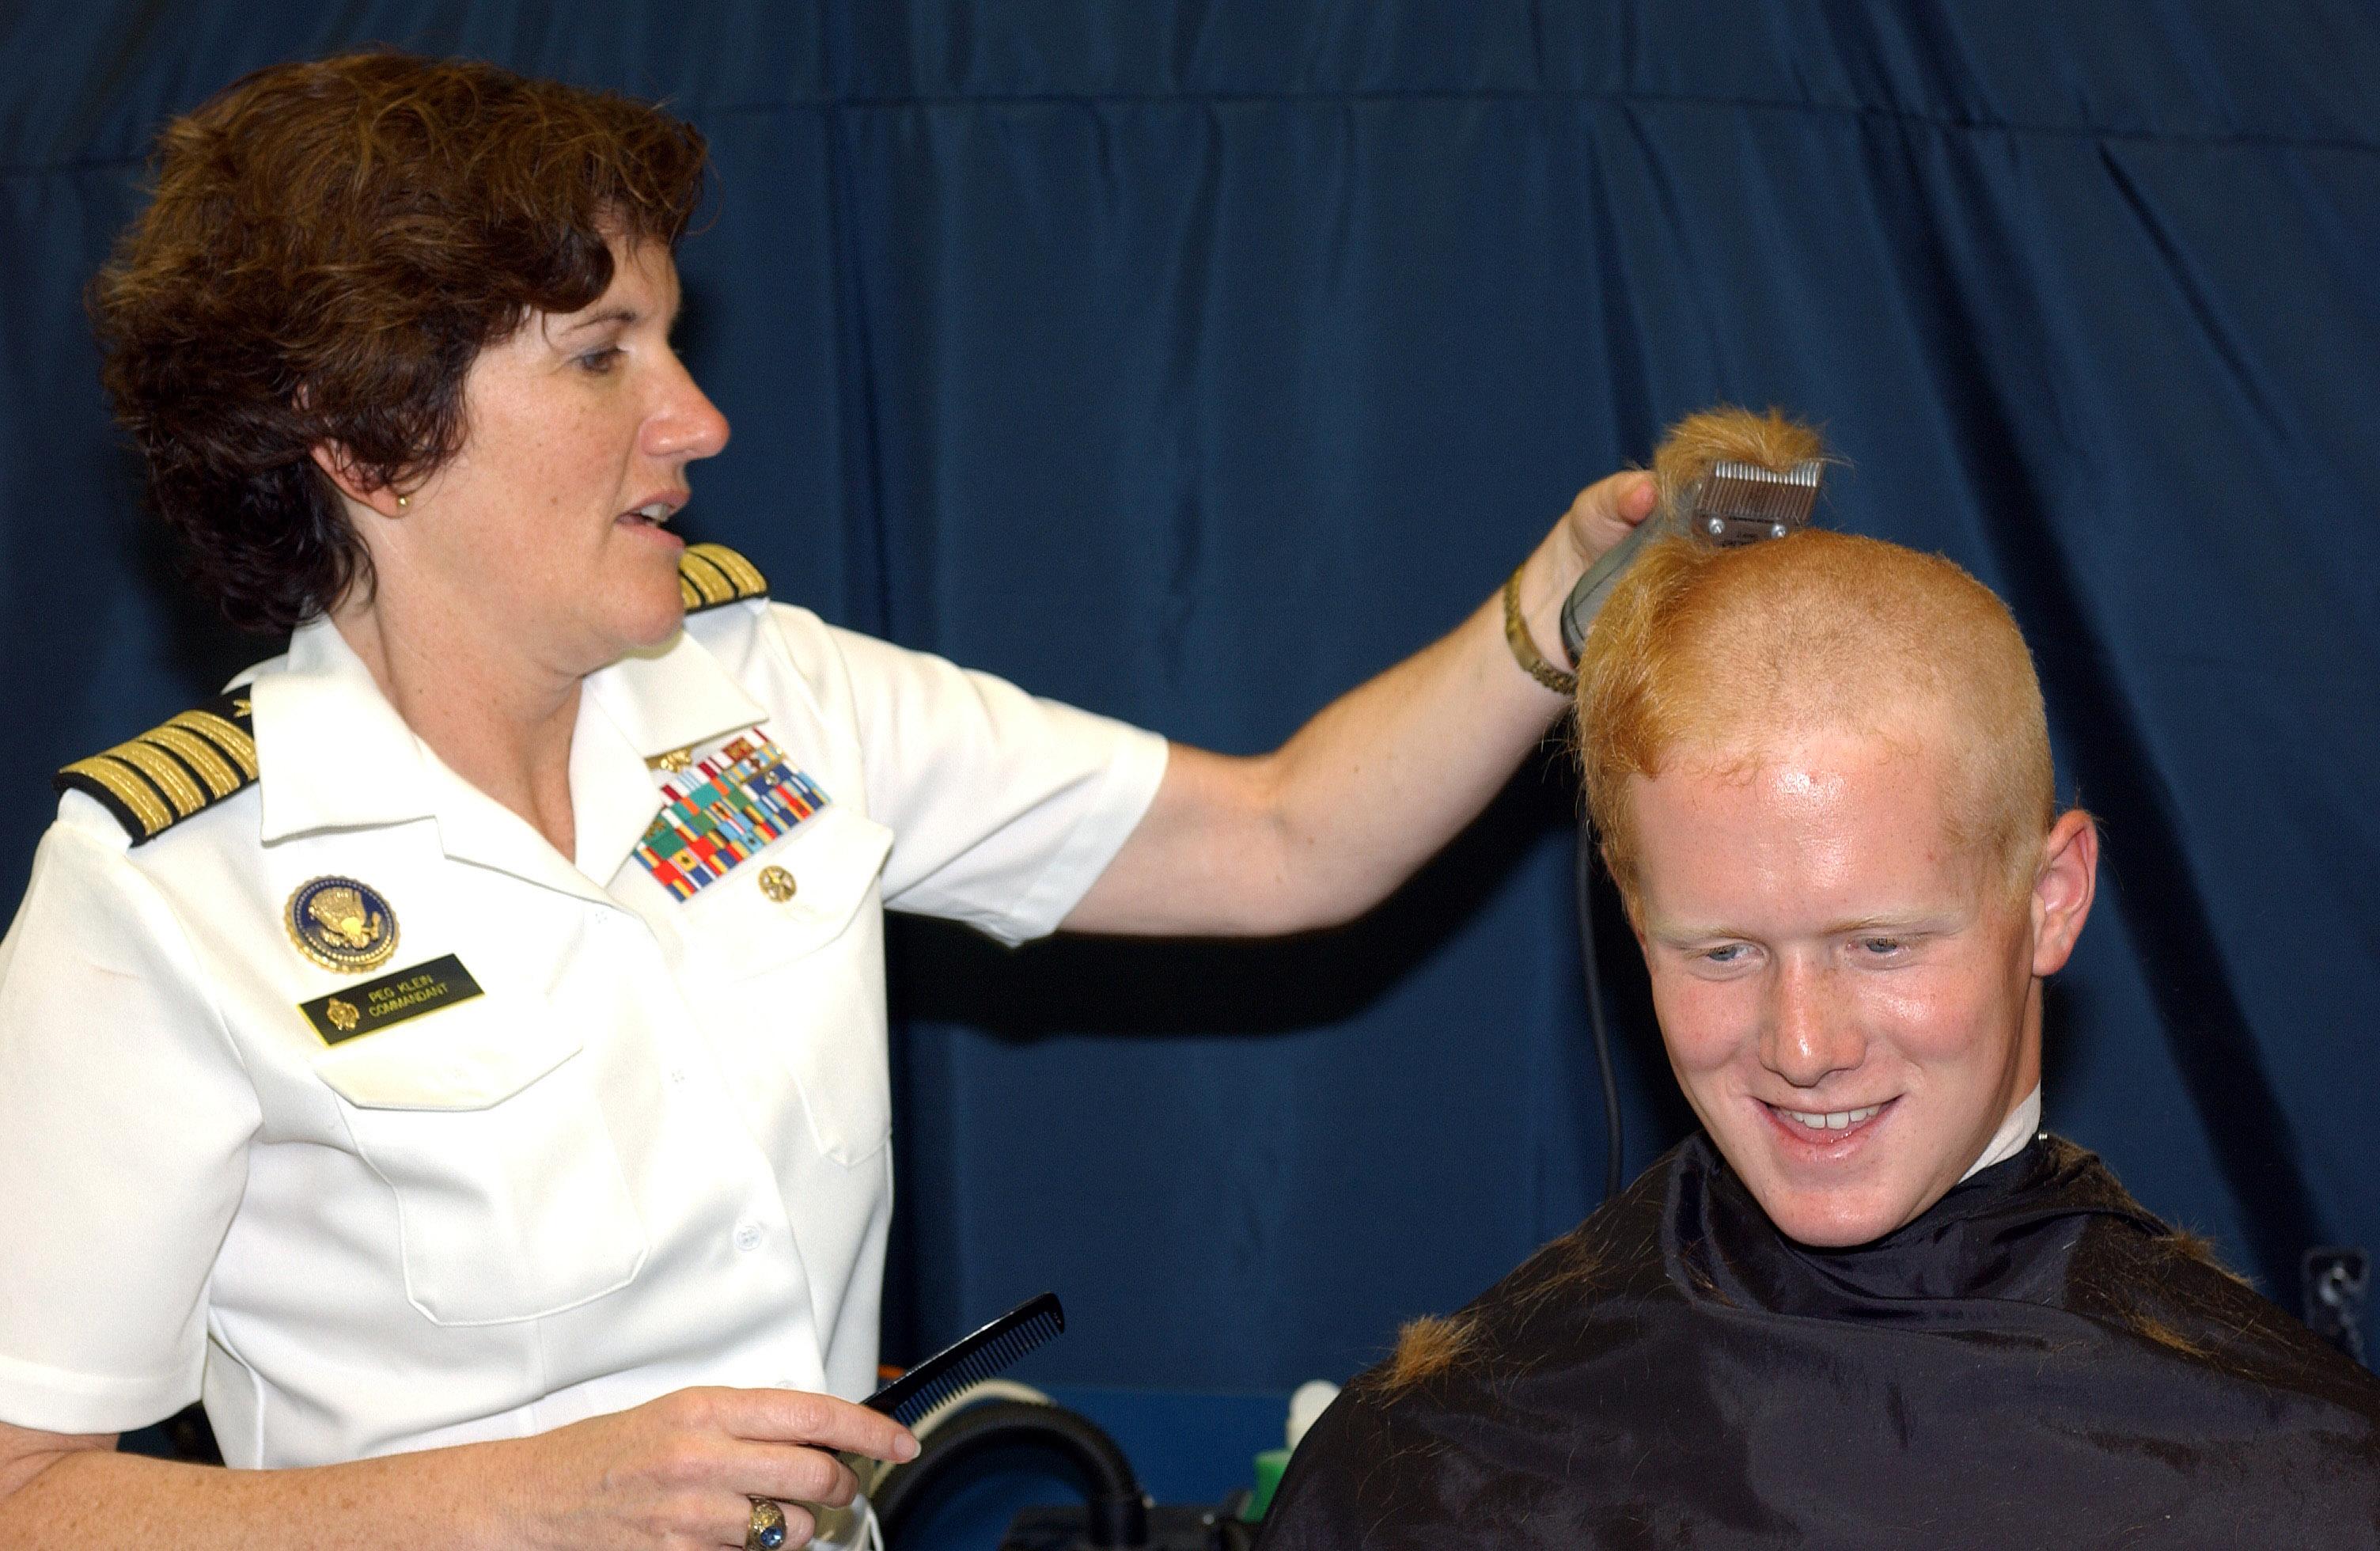 FileUS Navy 070627 N 1134L 002 Commandant Of Midshipmen